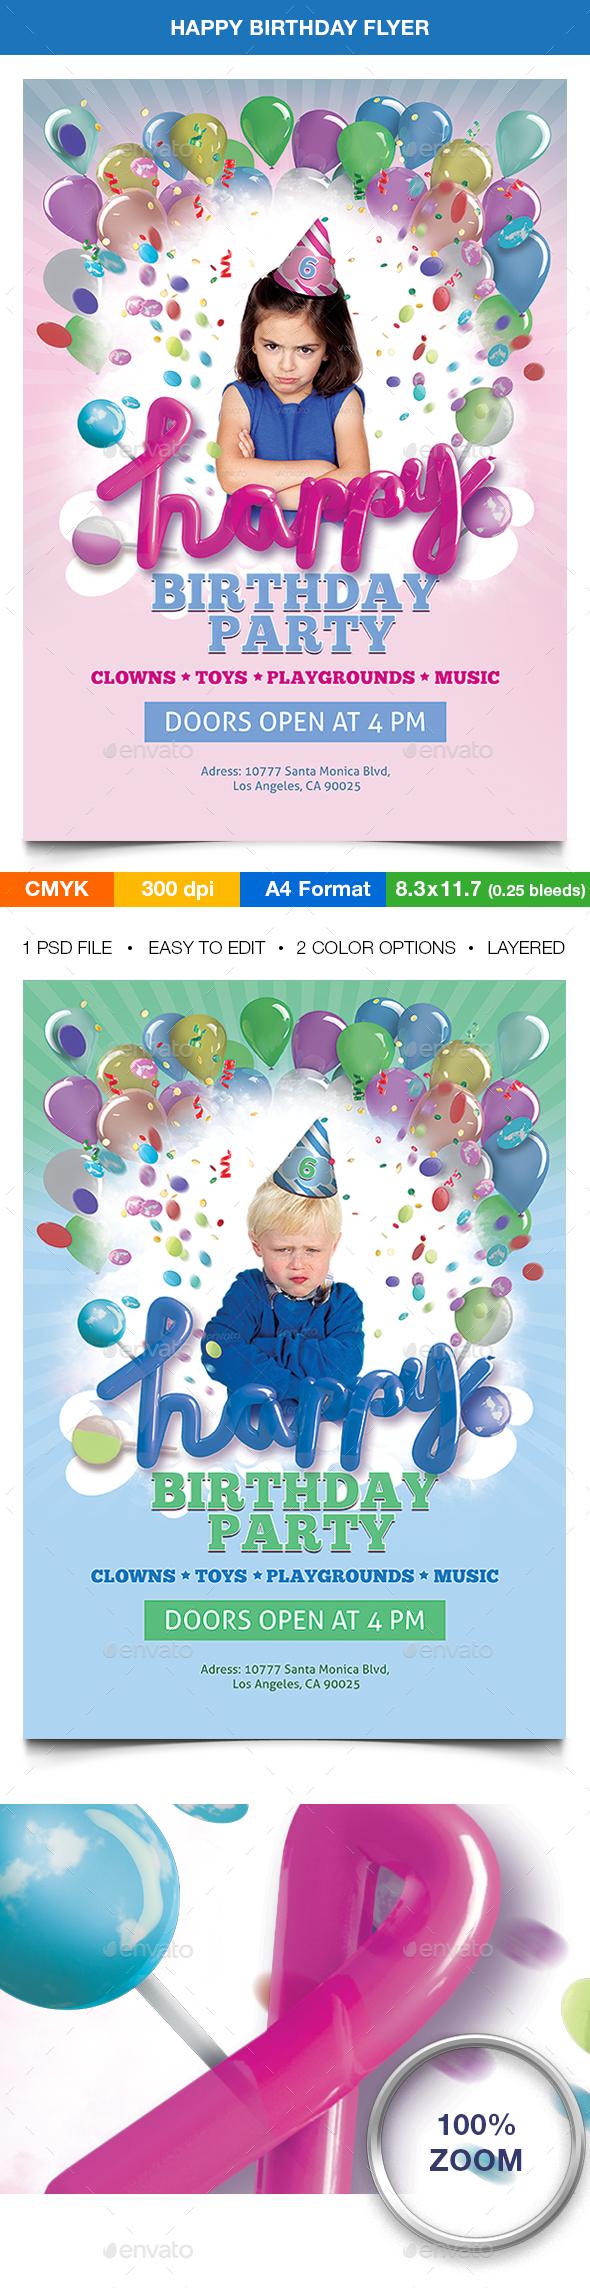 Happy Birthday Flyer Template Pinterest Flyer Template Event